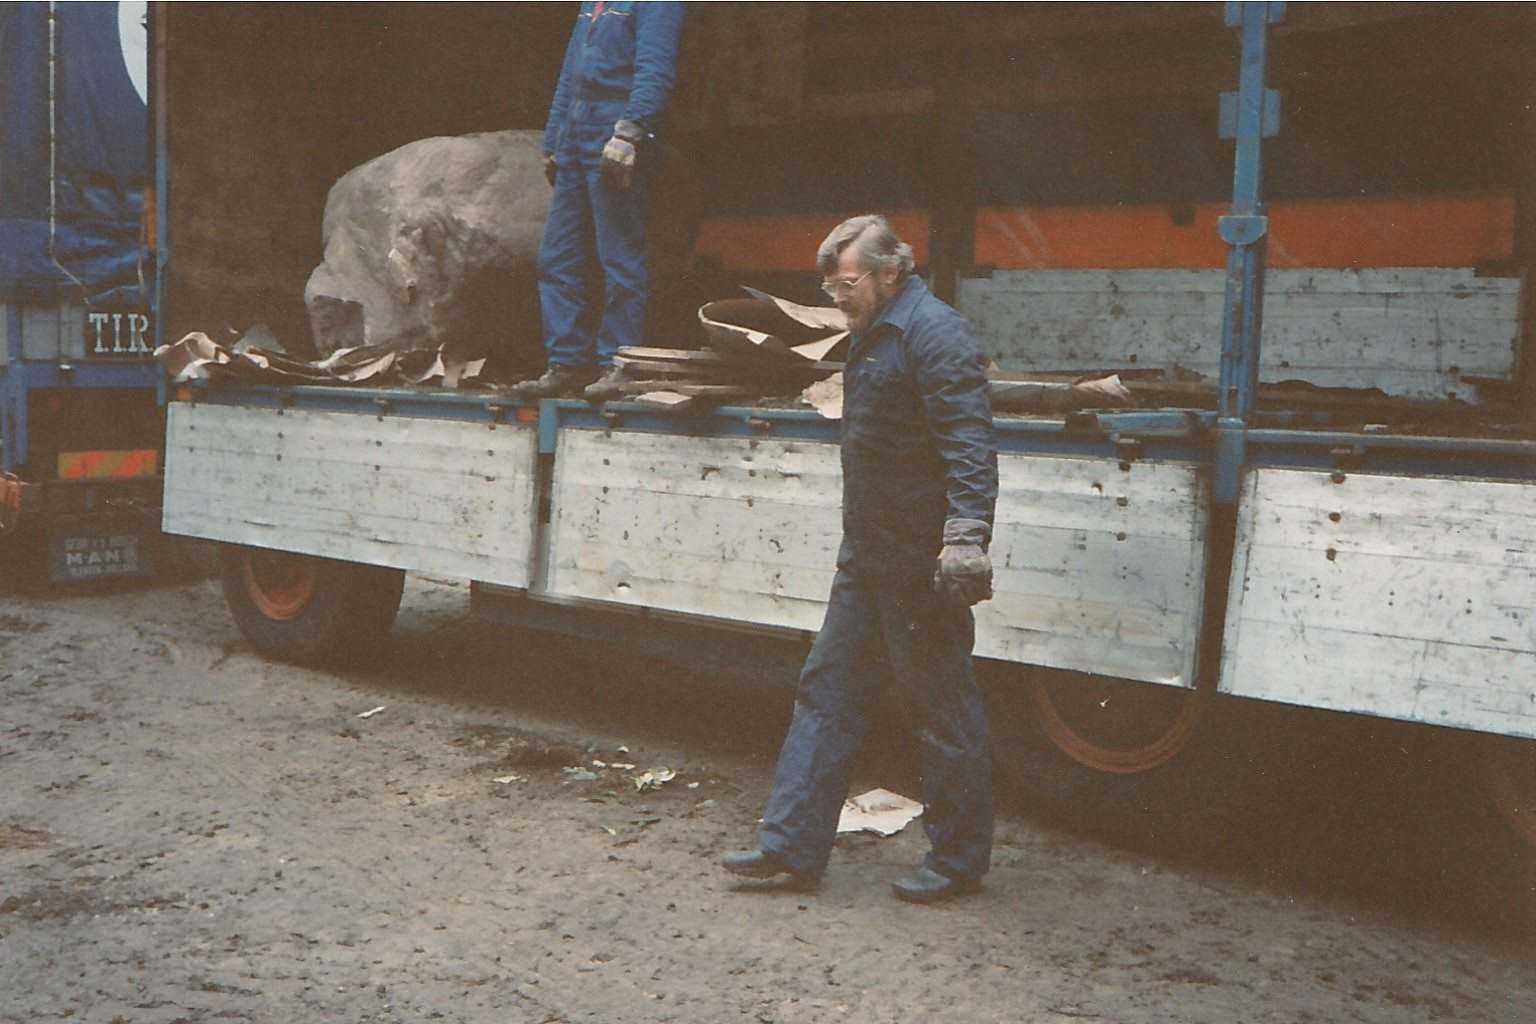 Bas-van-der-Zouwen-foto-archief-(38)